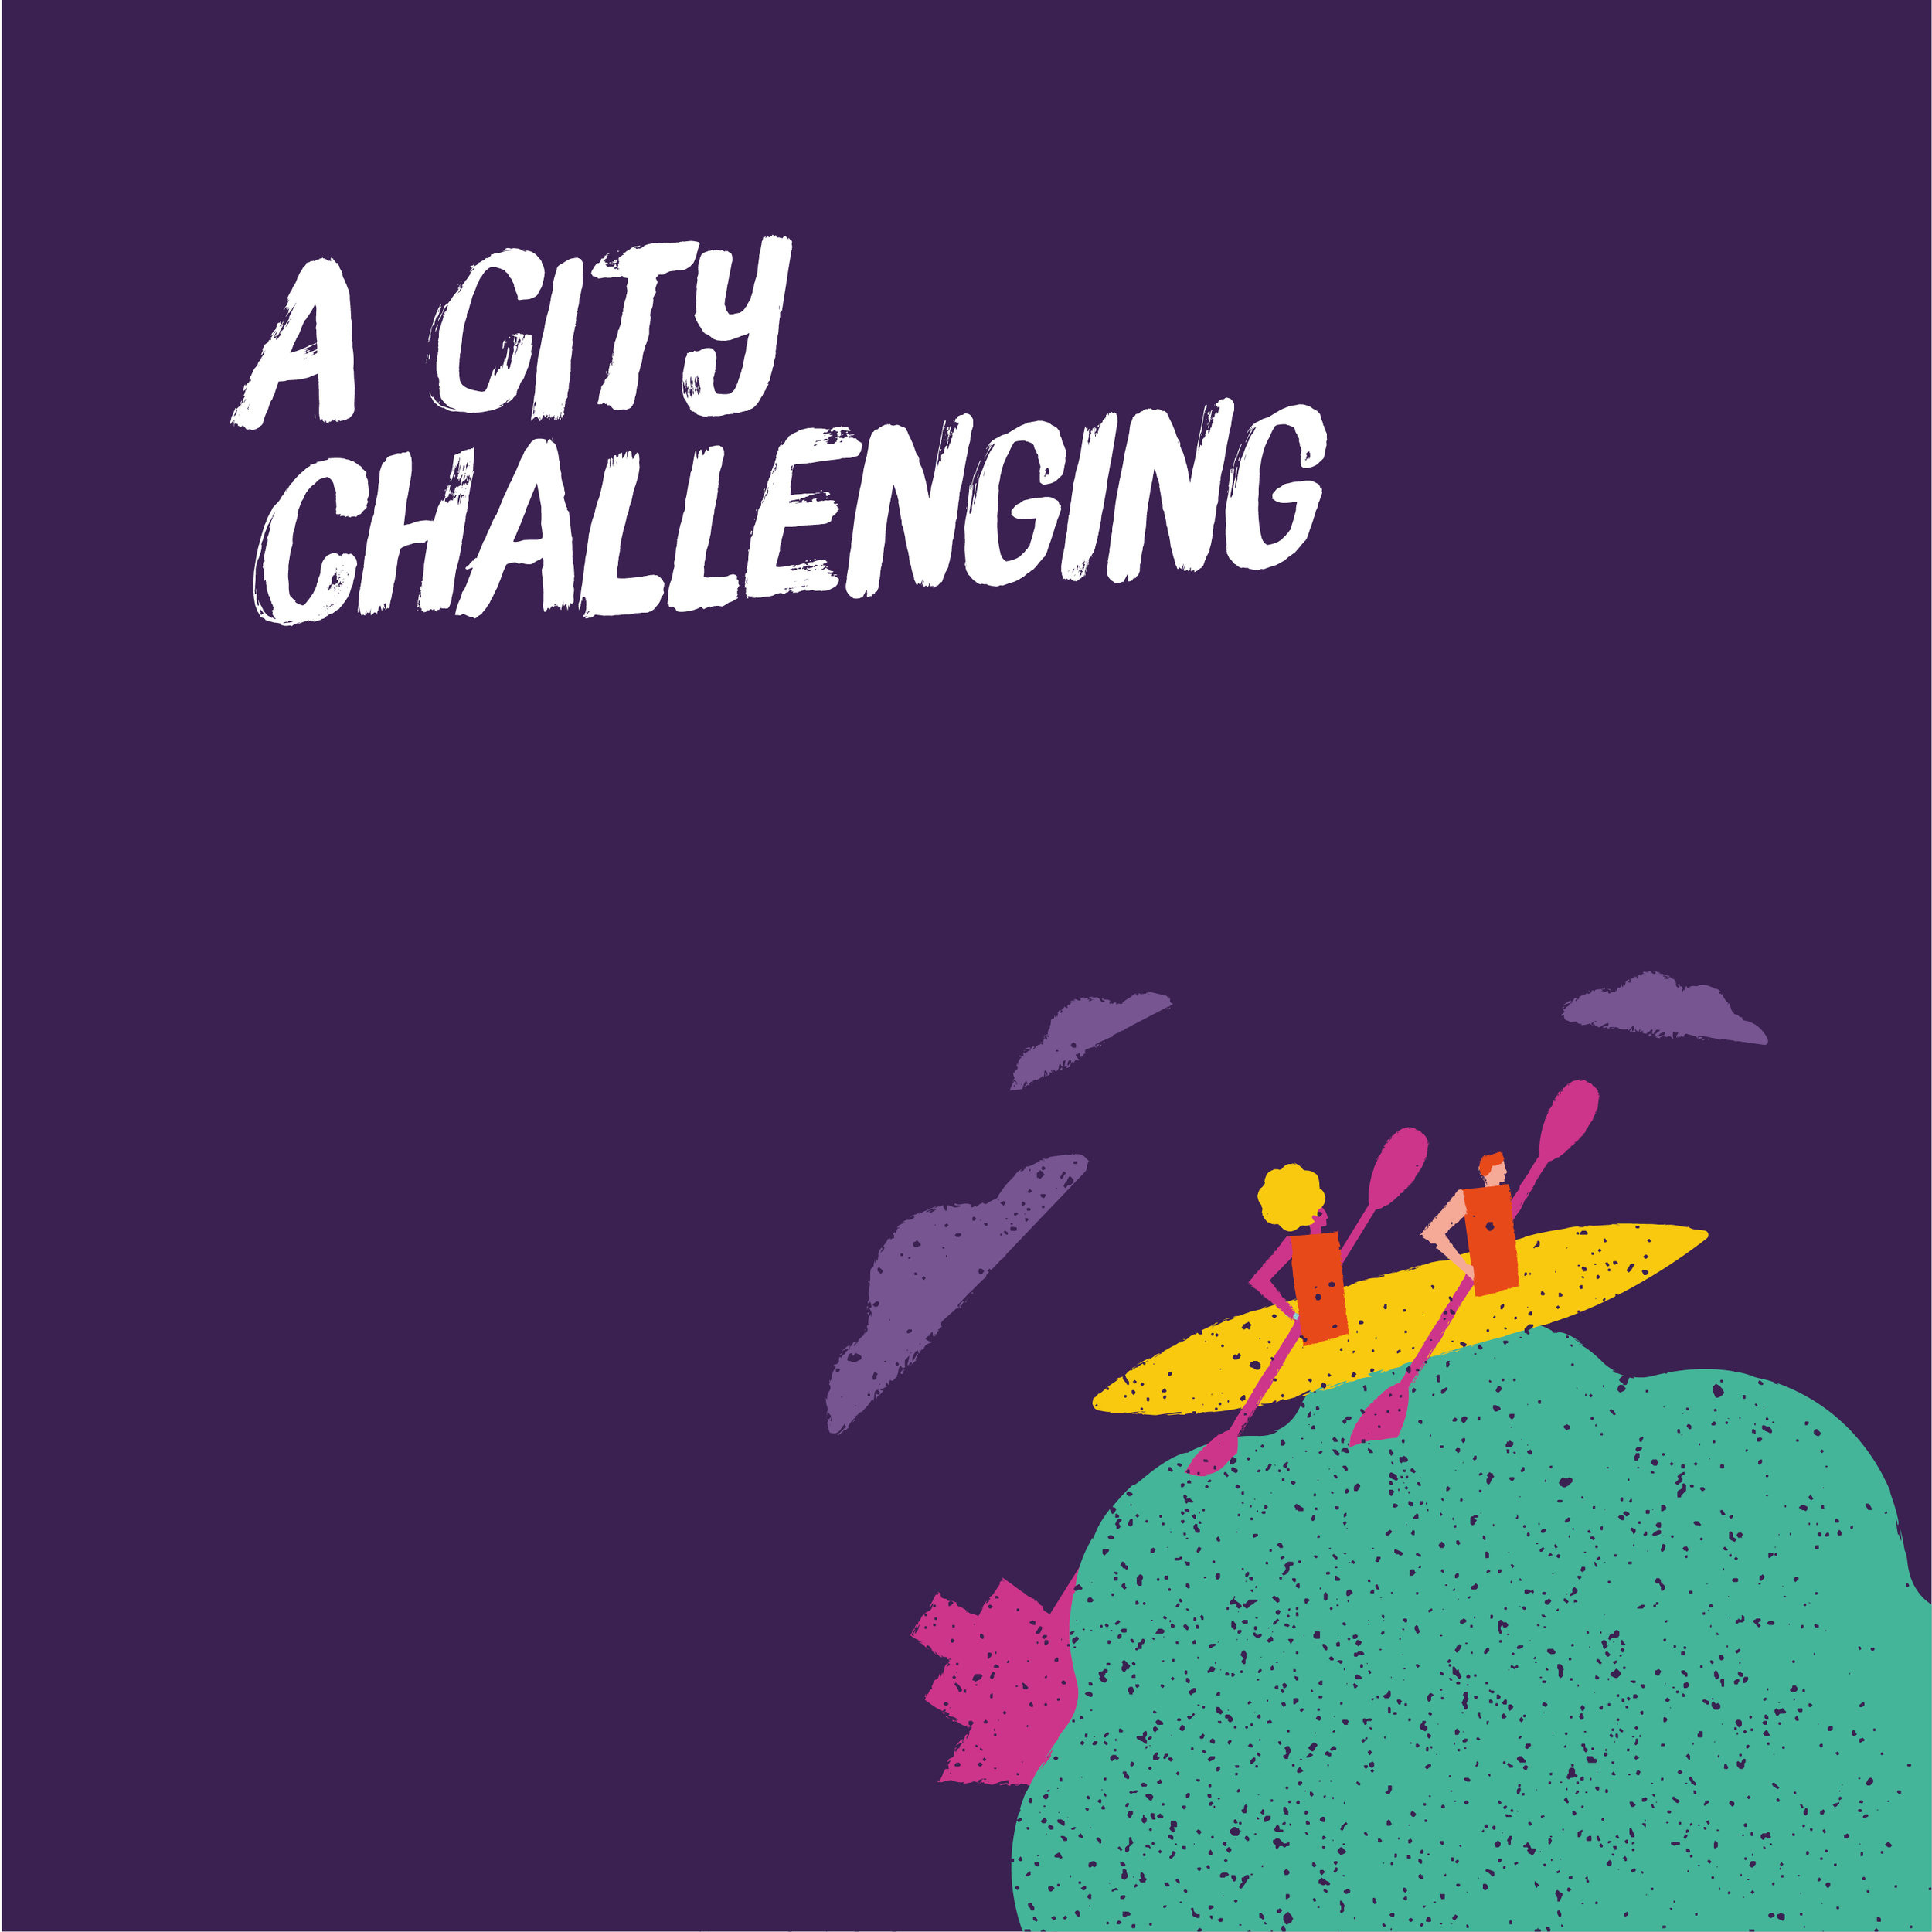 BCC_A CITY IMAGINING13.jpg